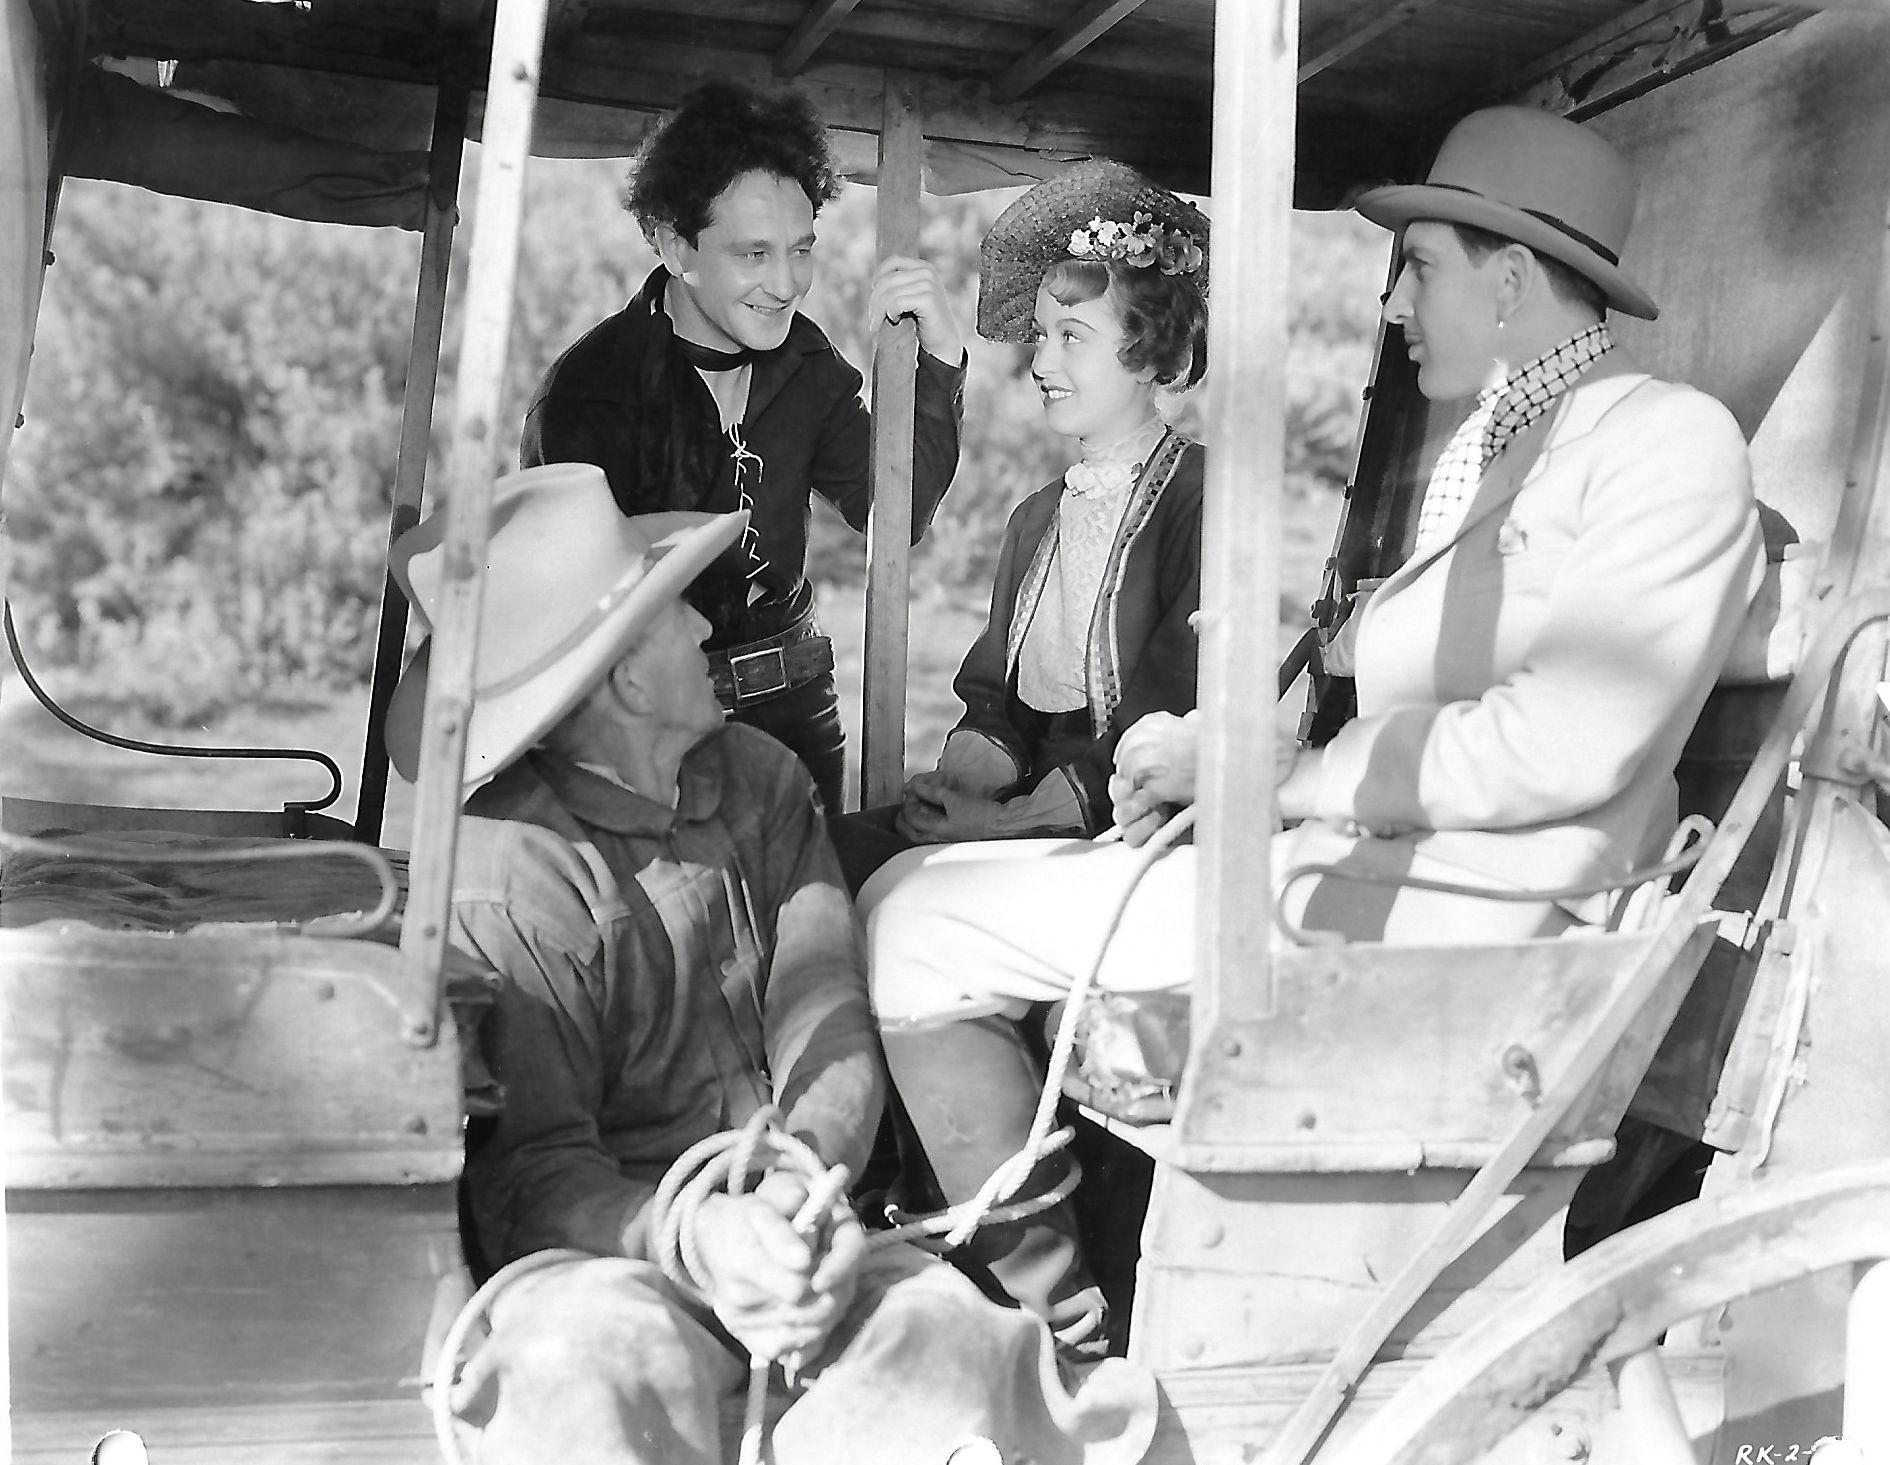 Marie Burton, Bill Cody, Allen Greer, and Stuart James in The Texas Rambler (1935)